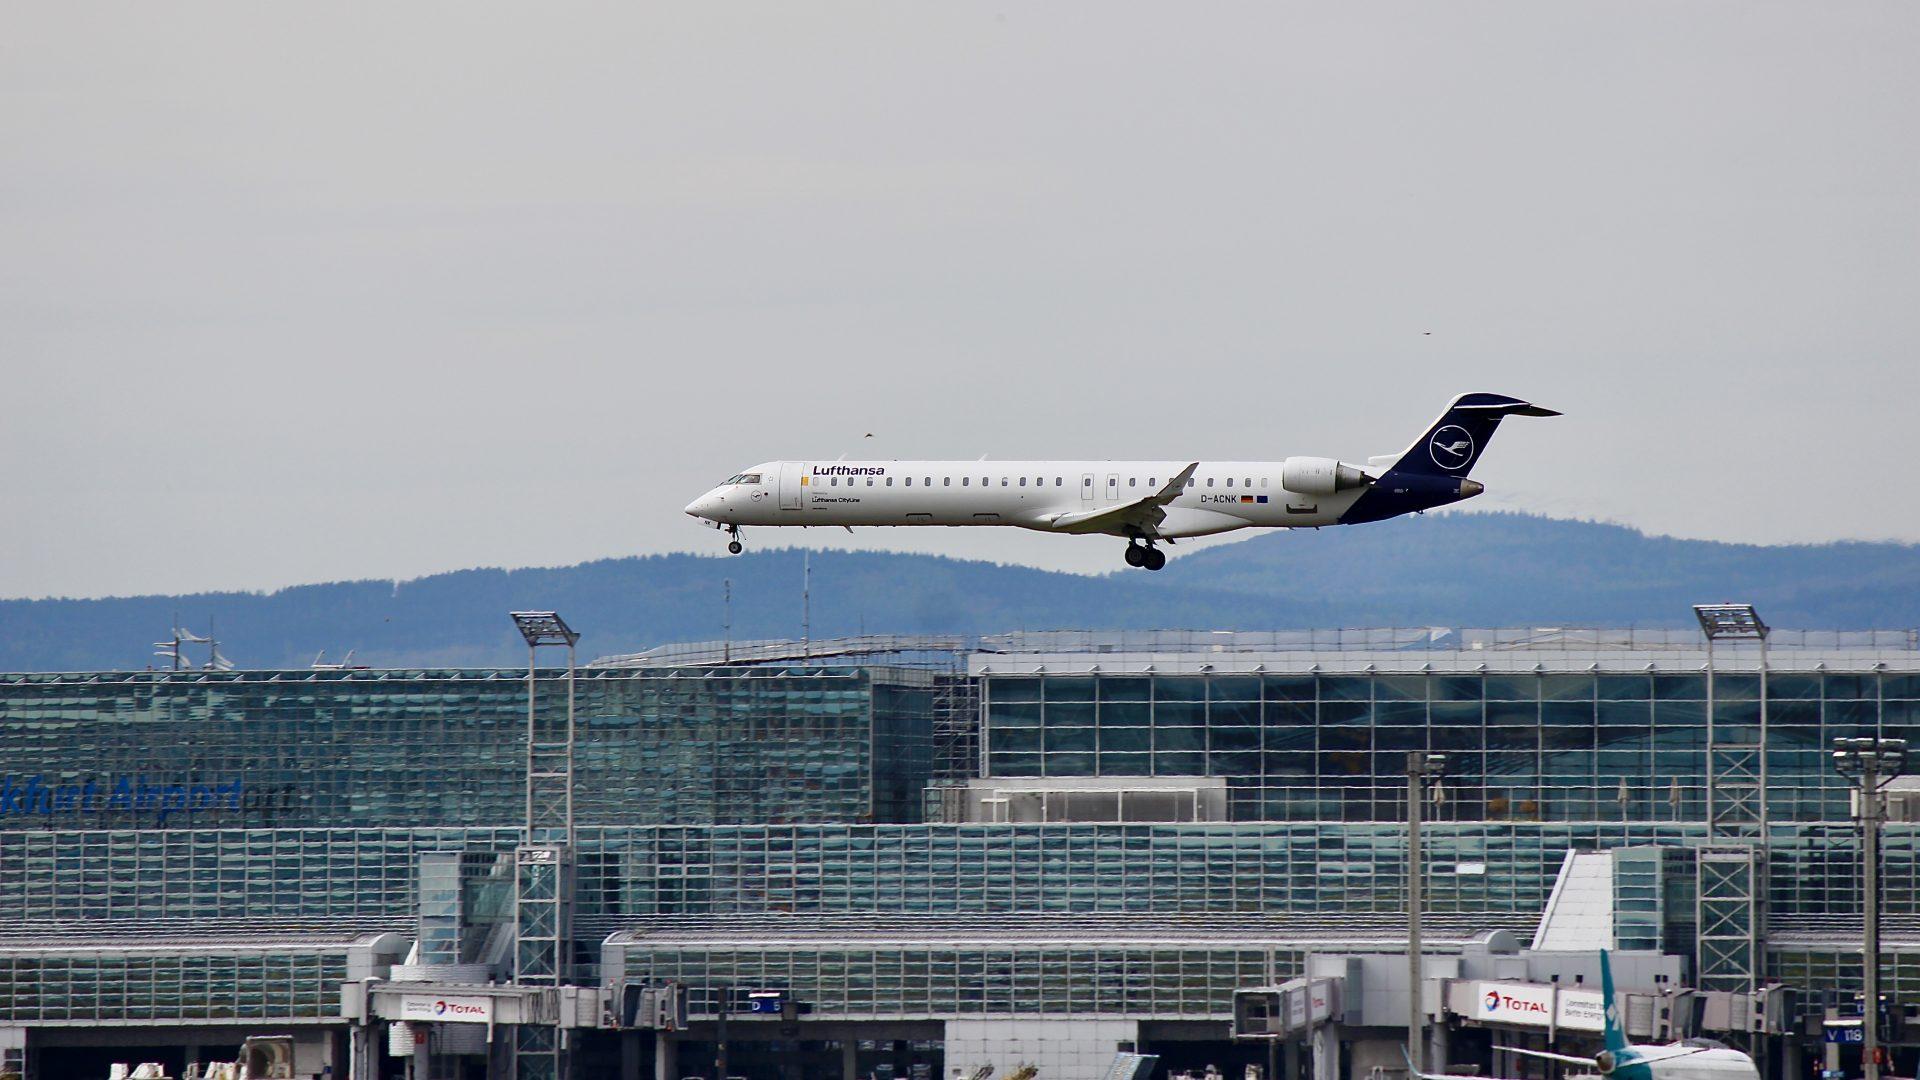 Lufthansa Cityline CRJ-900